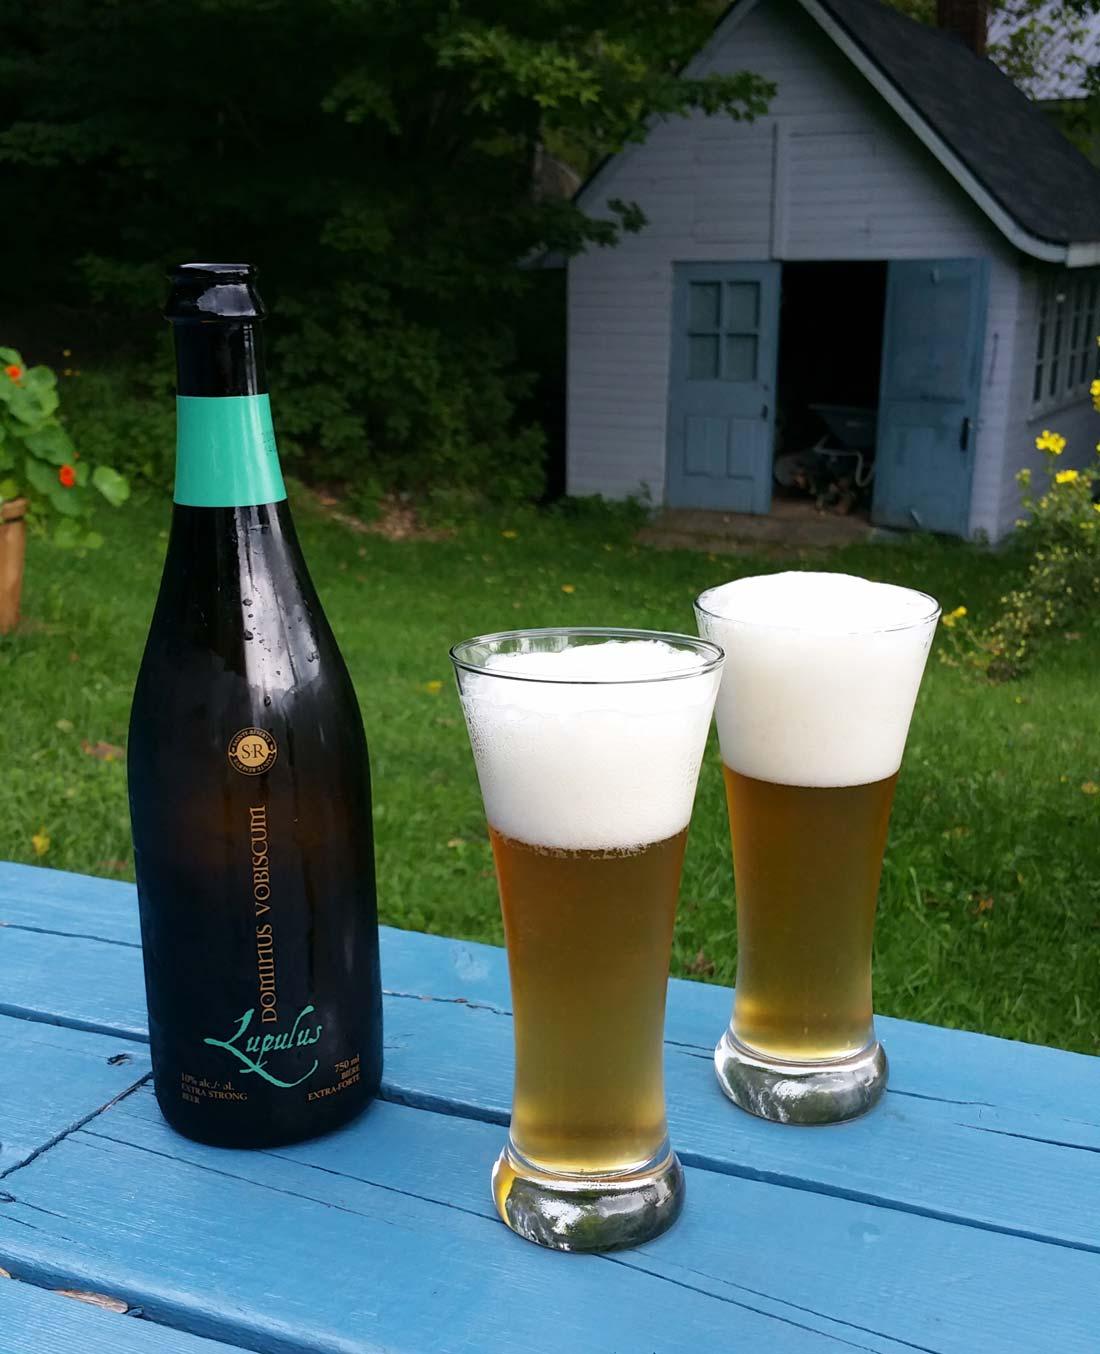 Bière Lupulus microbrasserie de Charlevoix